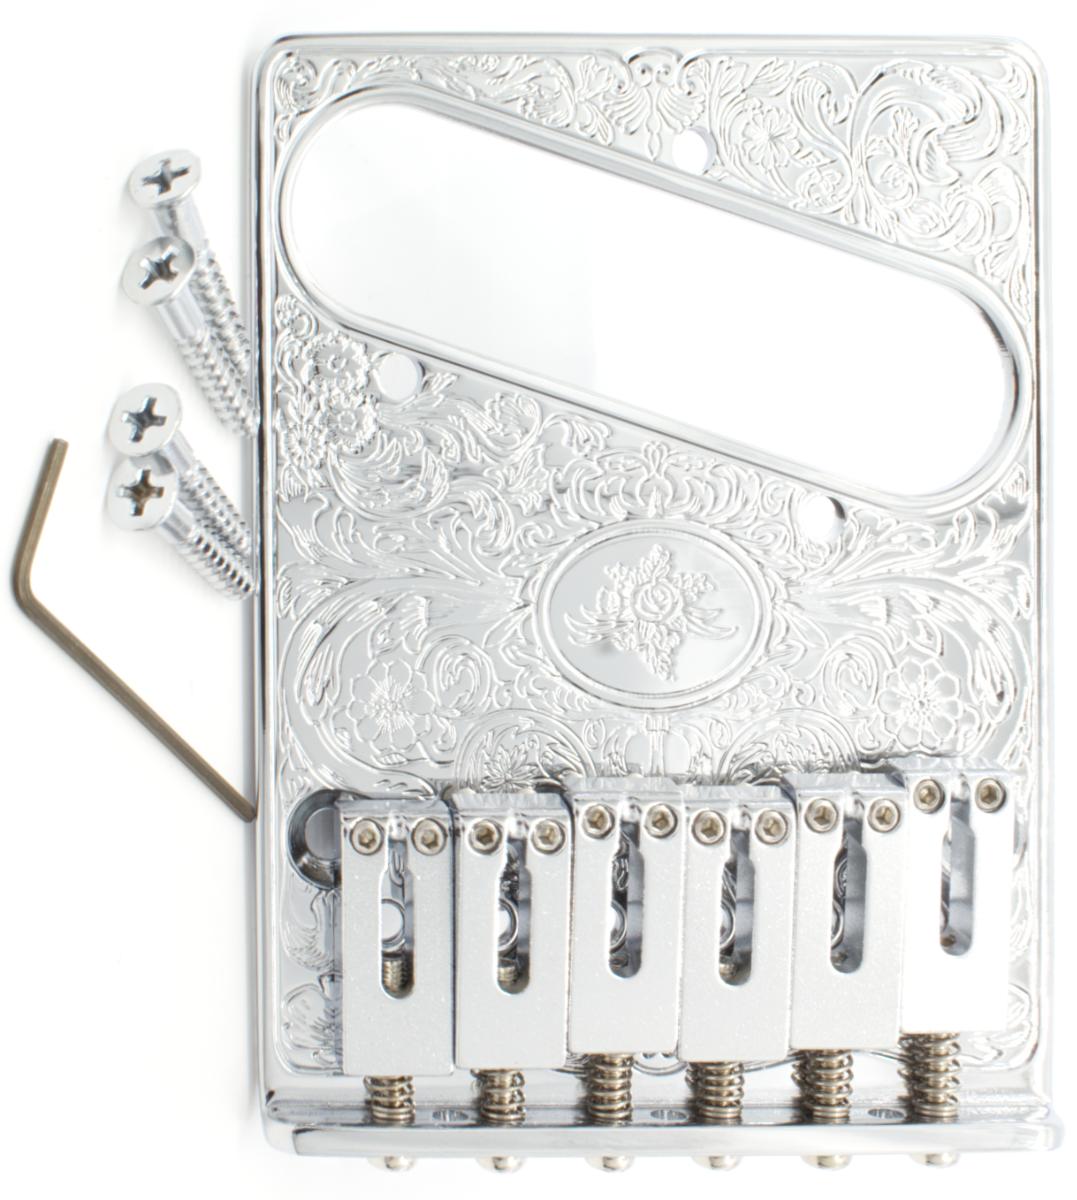 Gotoh Artistic Engraved Series Hardware